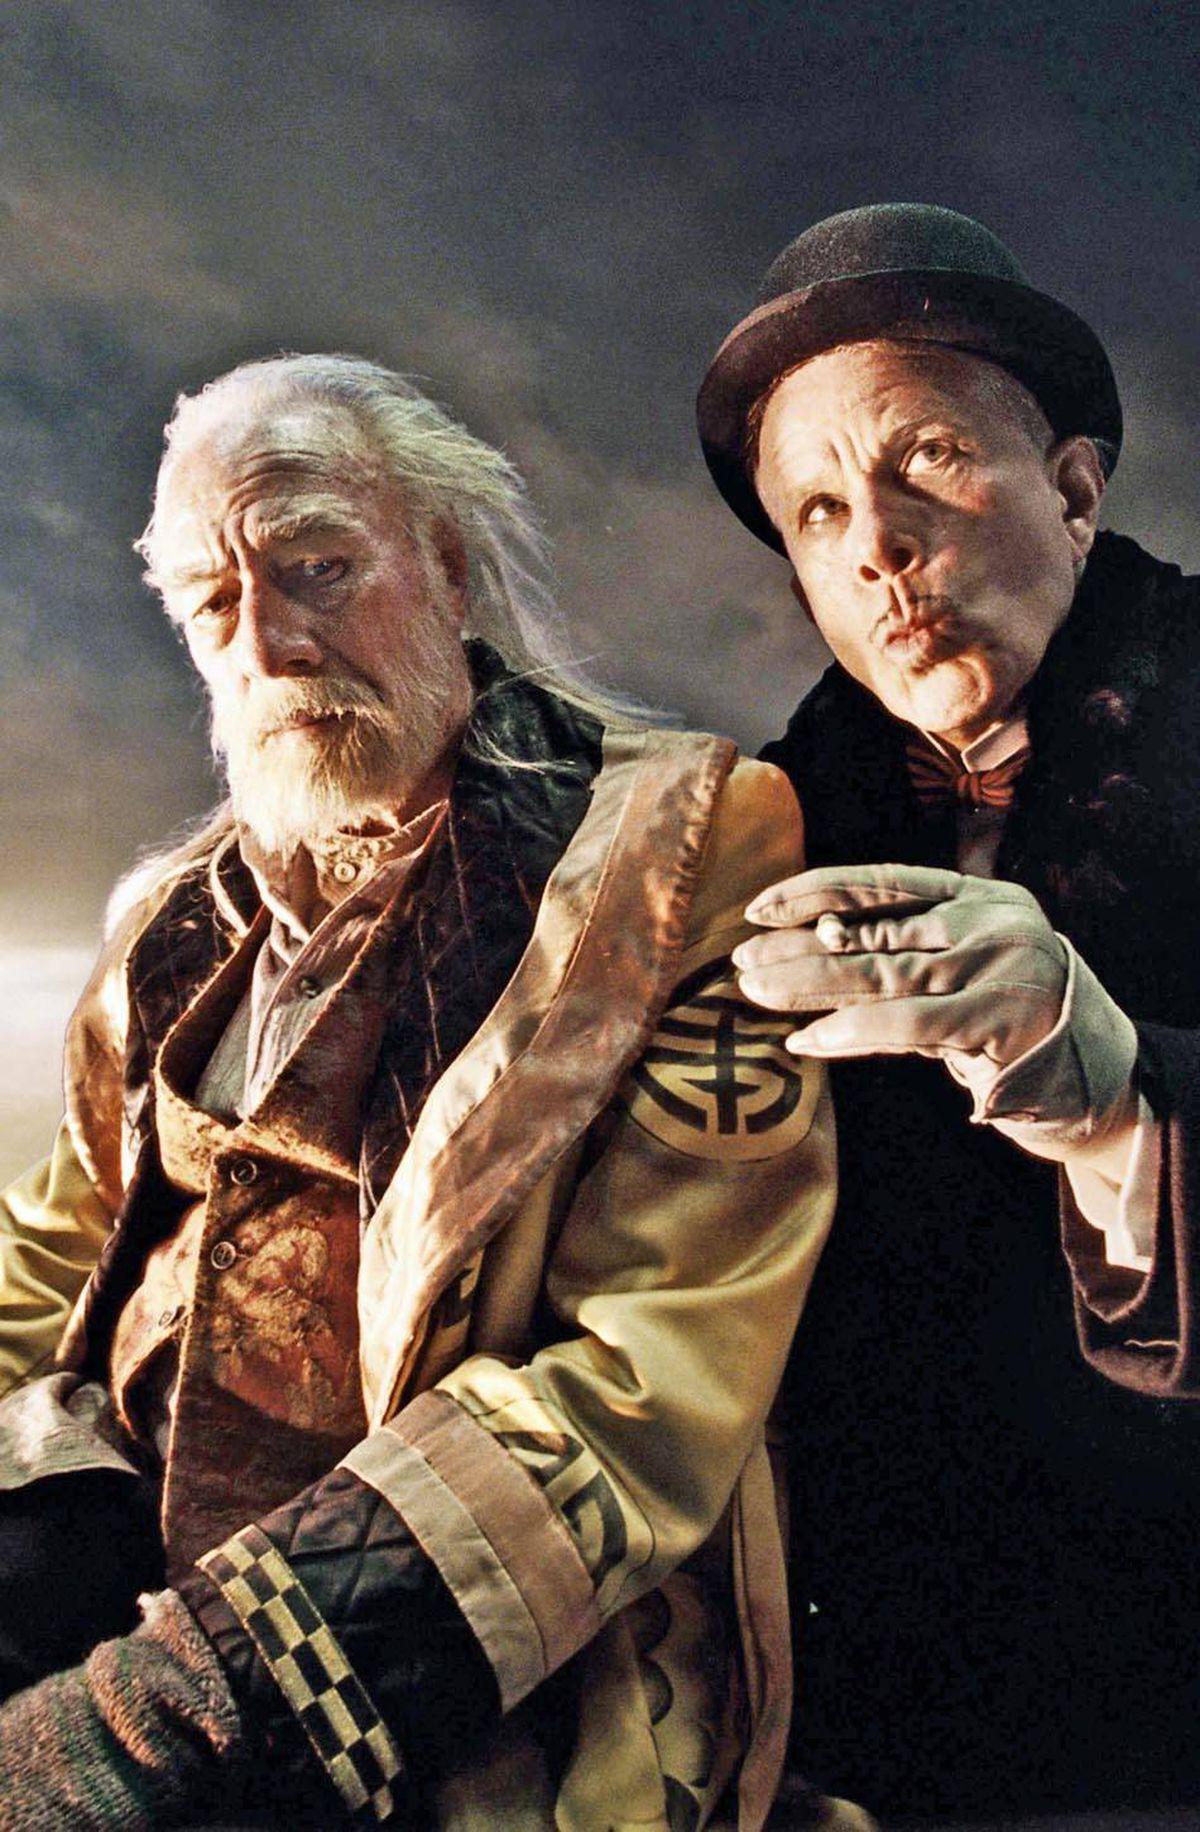 Christopher Plummer and Tom Waits in The Imaginarium of Doctor Parnassus (2009).